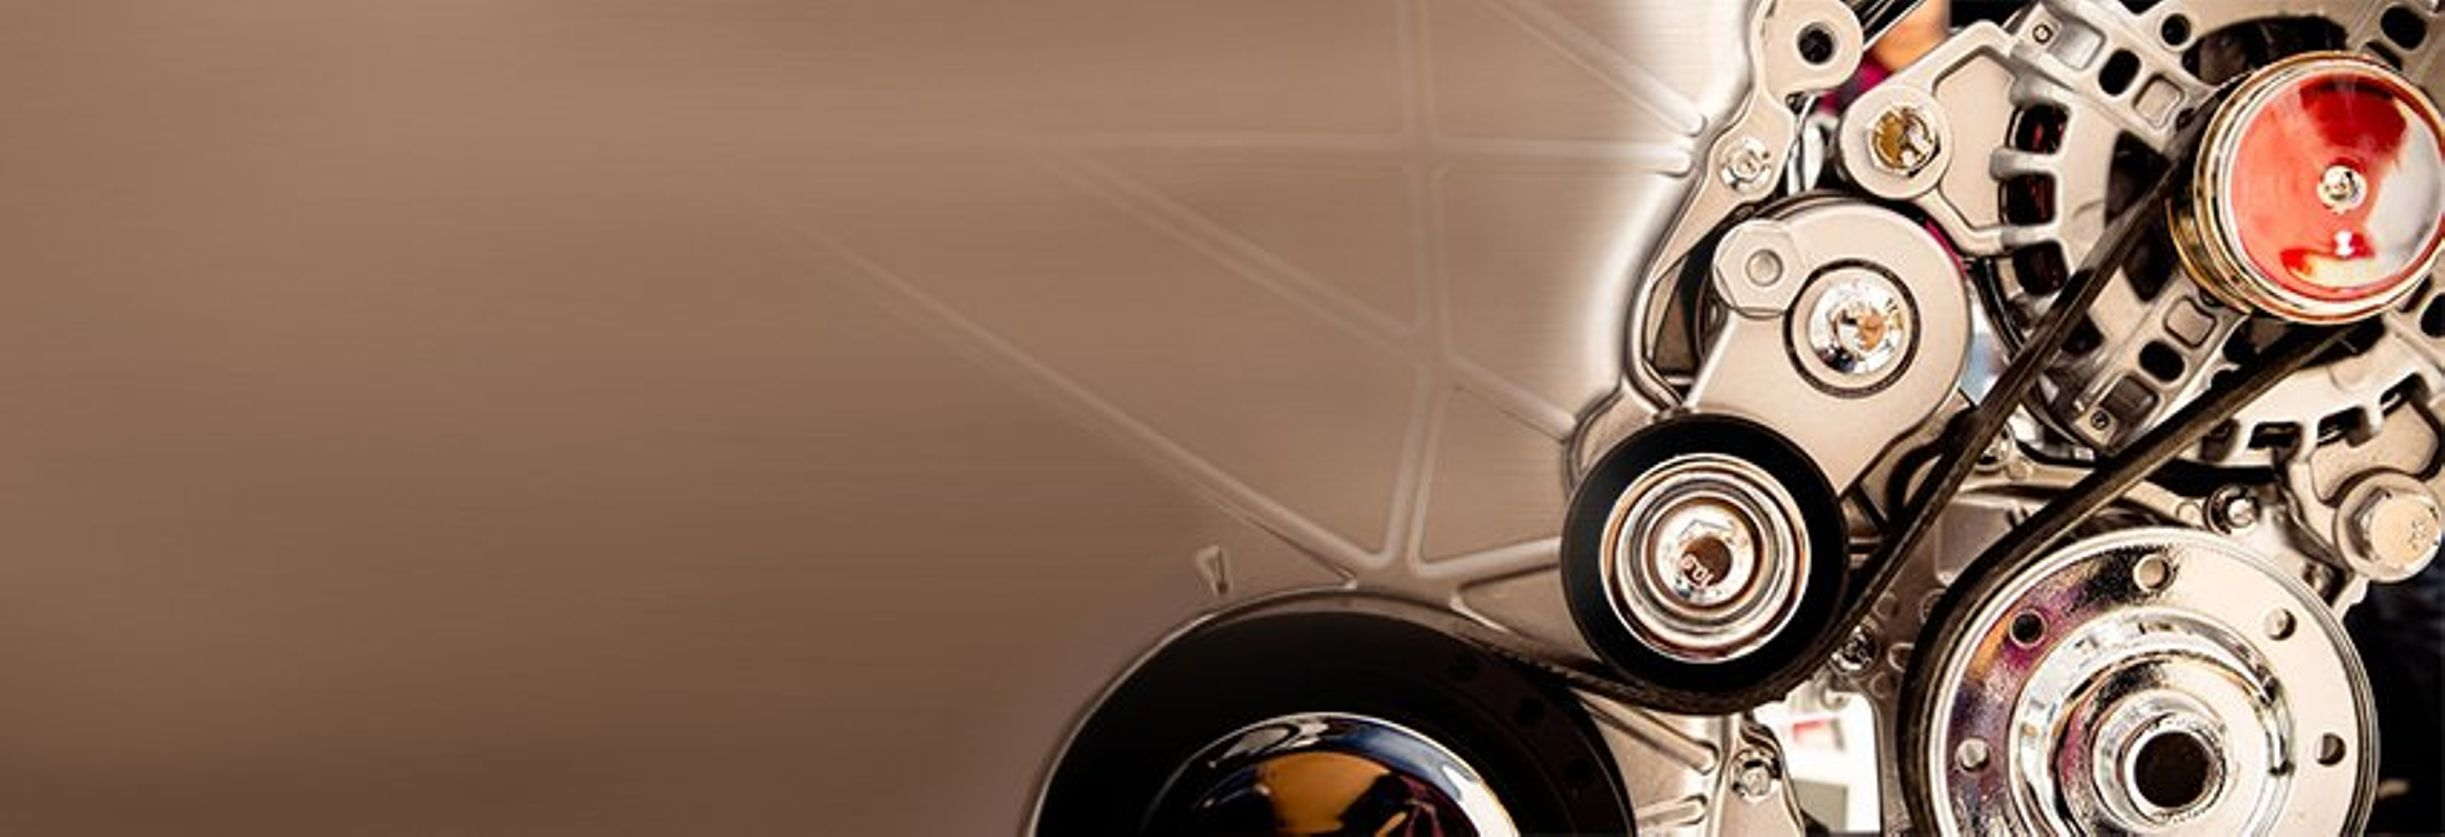 Details about GV Front Bumper Lip Urethane Mazda MX5 01-05 NB2 Front  Spoiler Lip